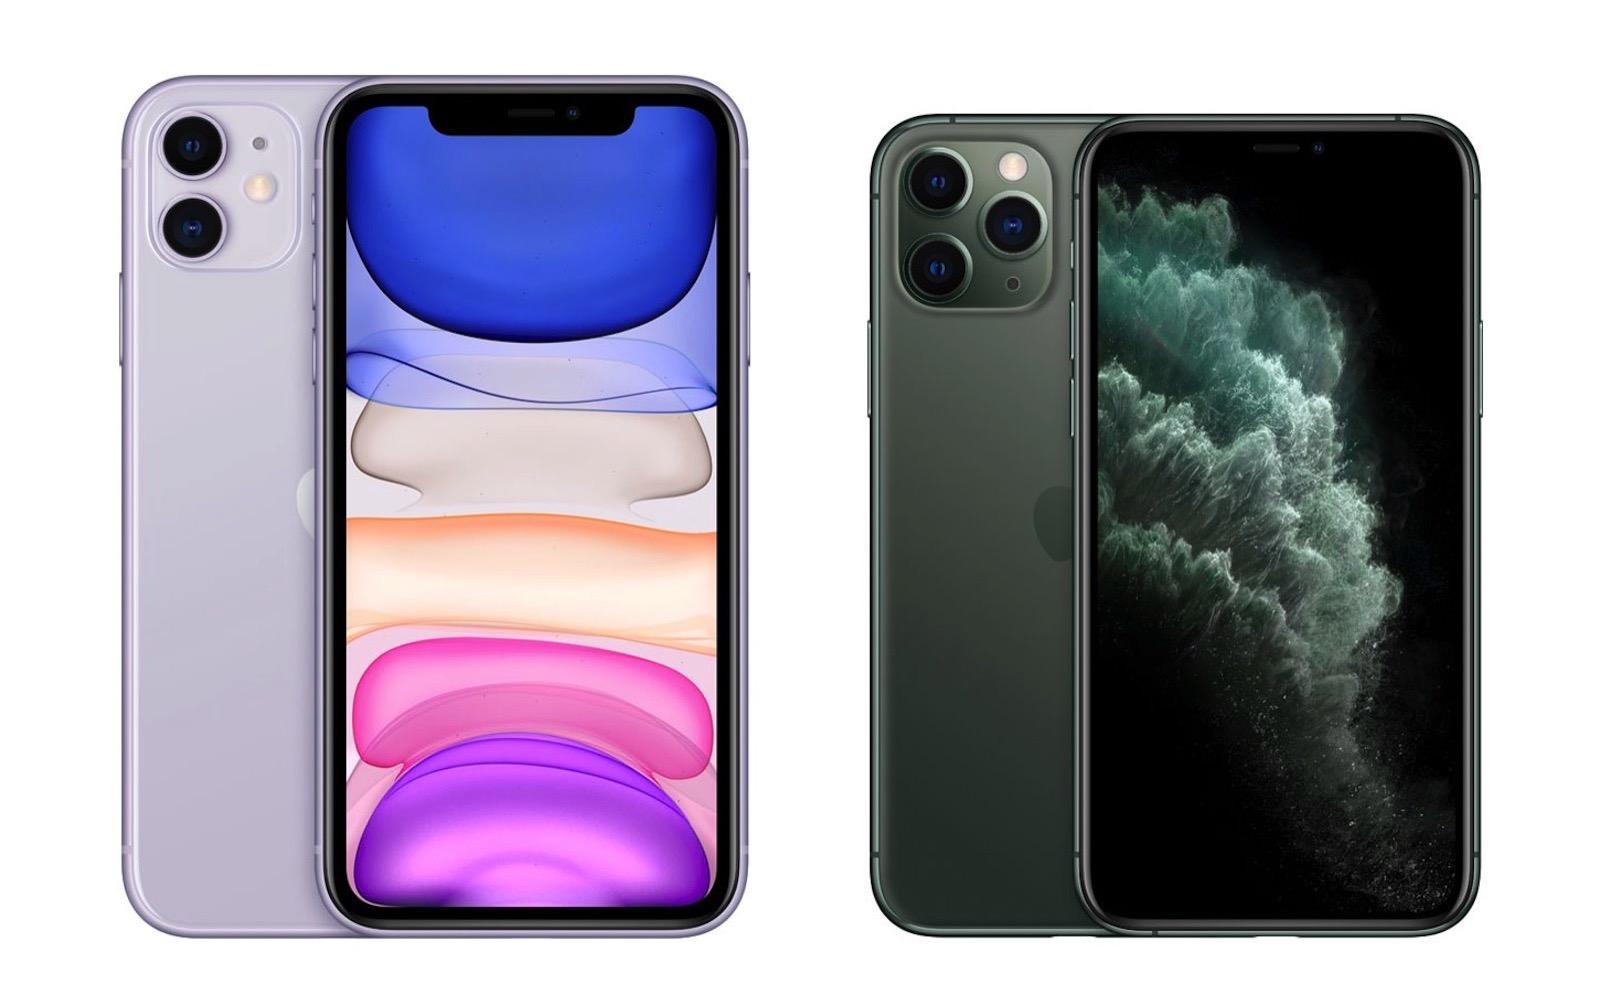 Iphone11 vs iphone 11 pro